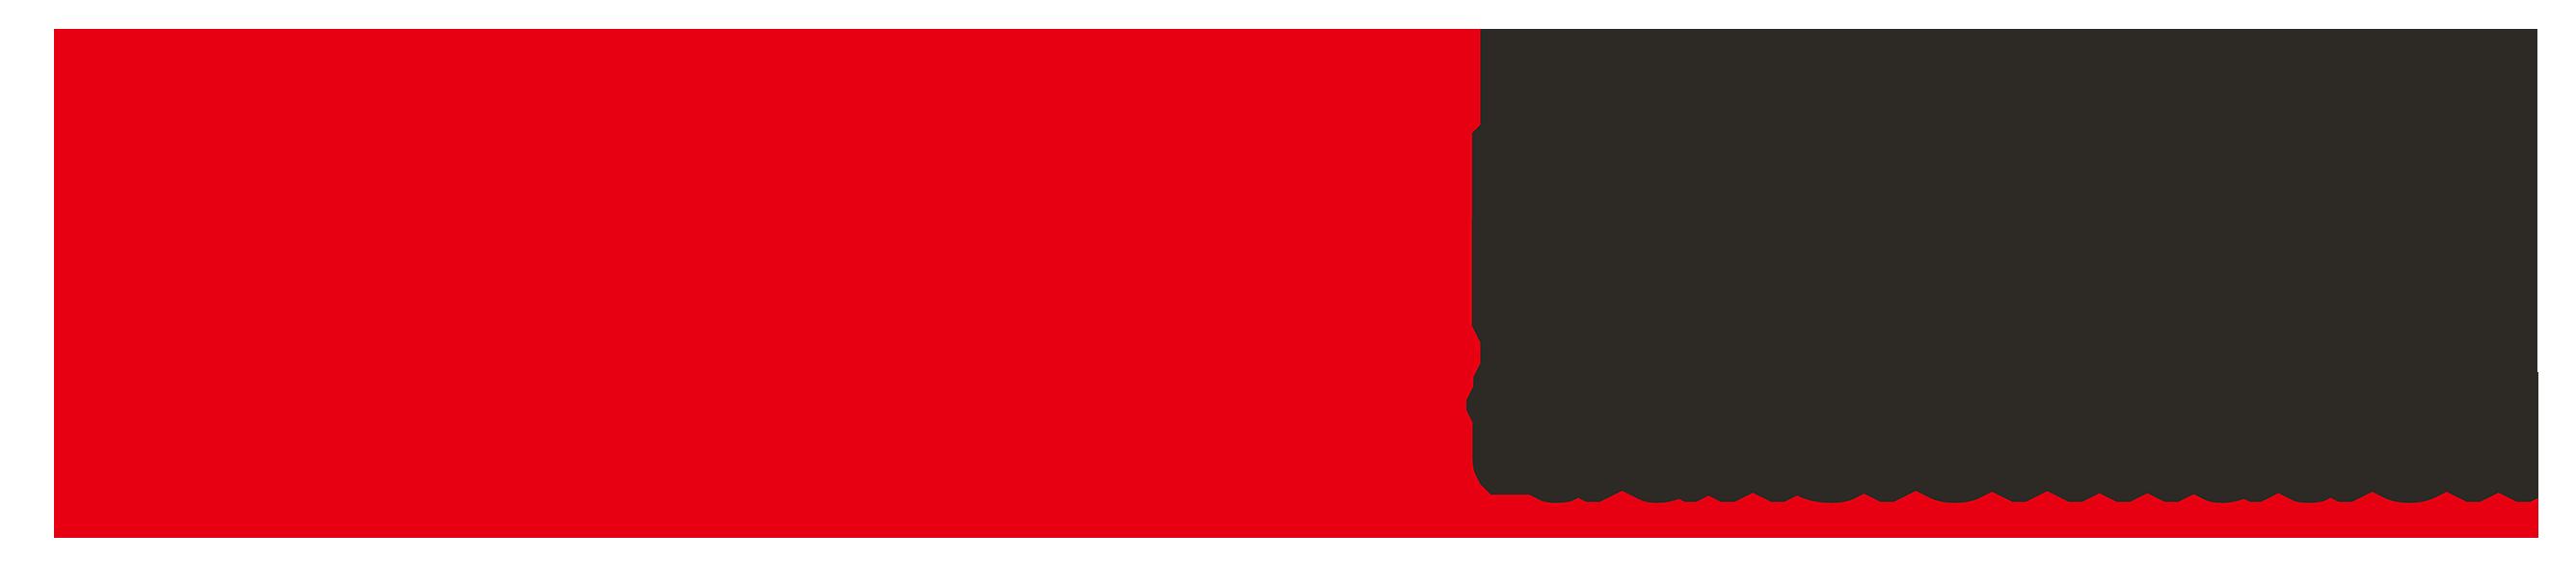 logo_20190920